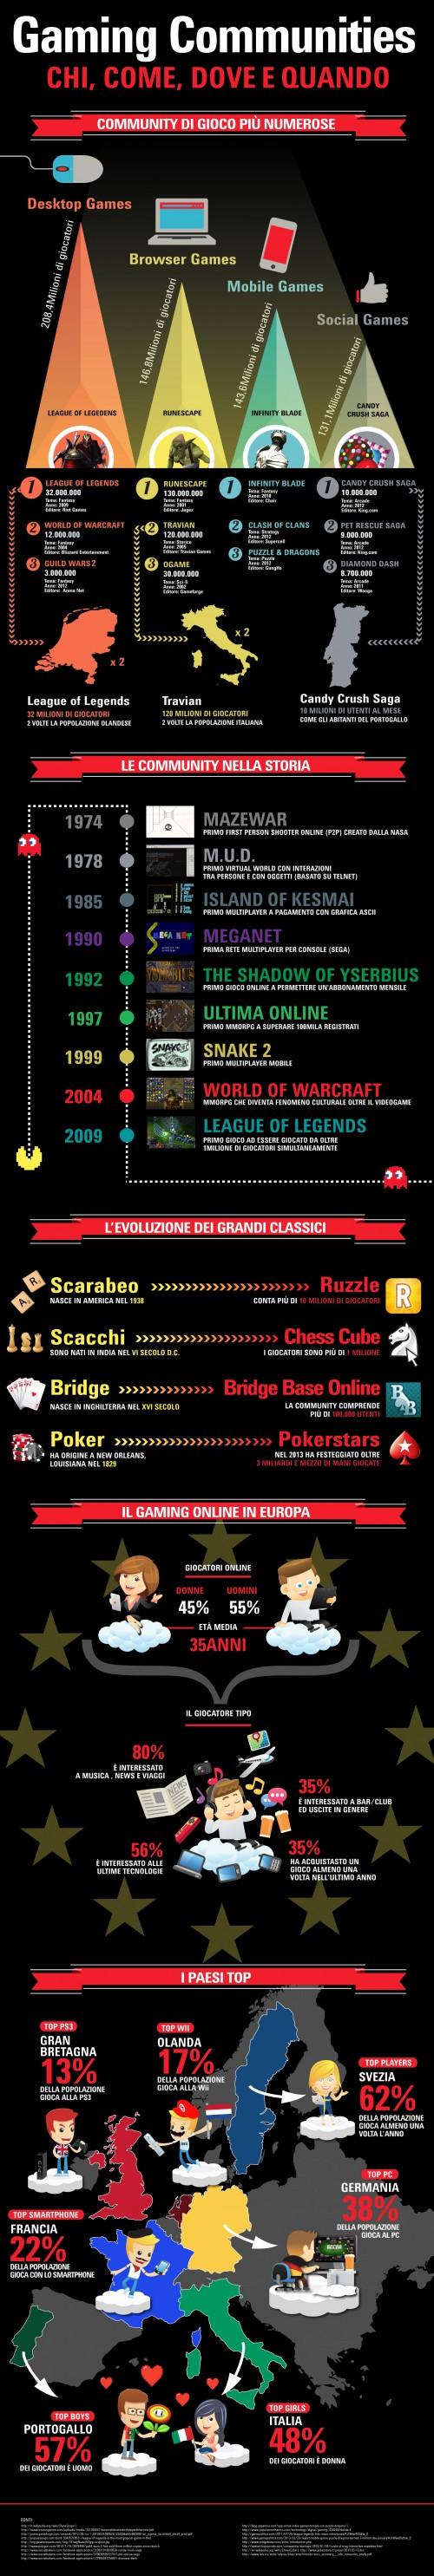 Gaming Communities - L'Infografica